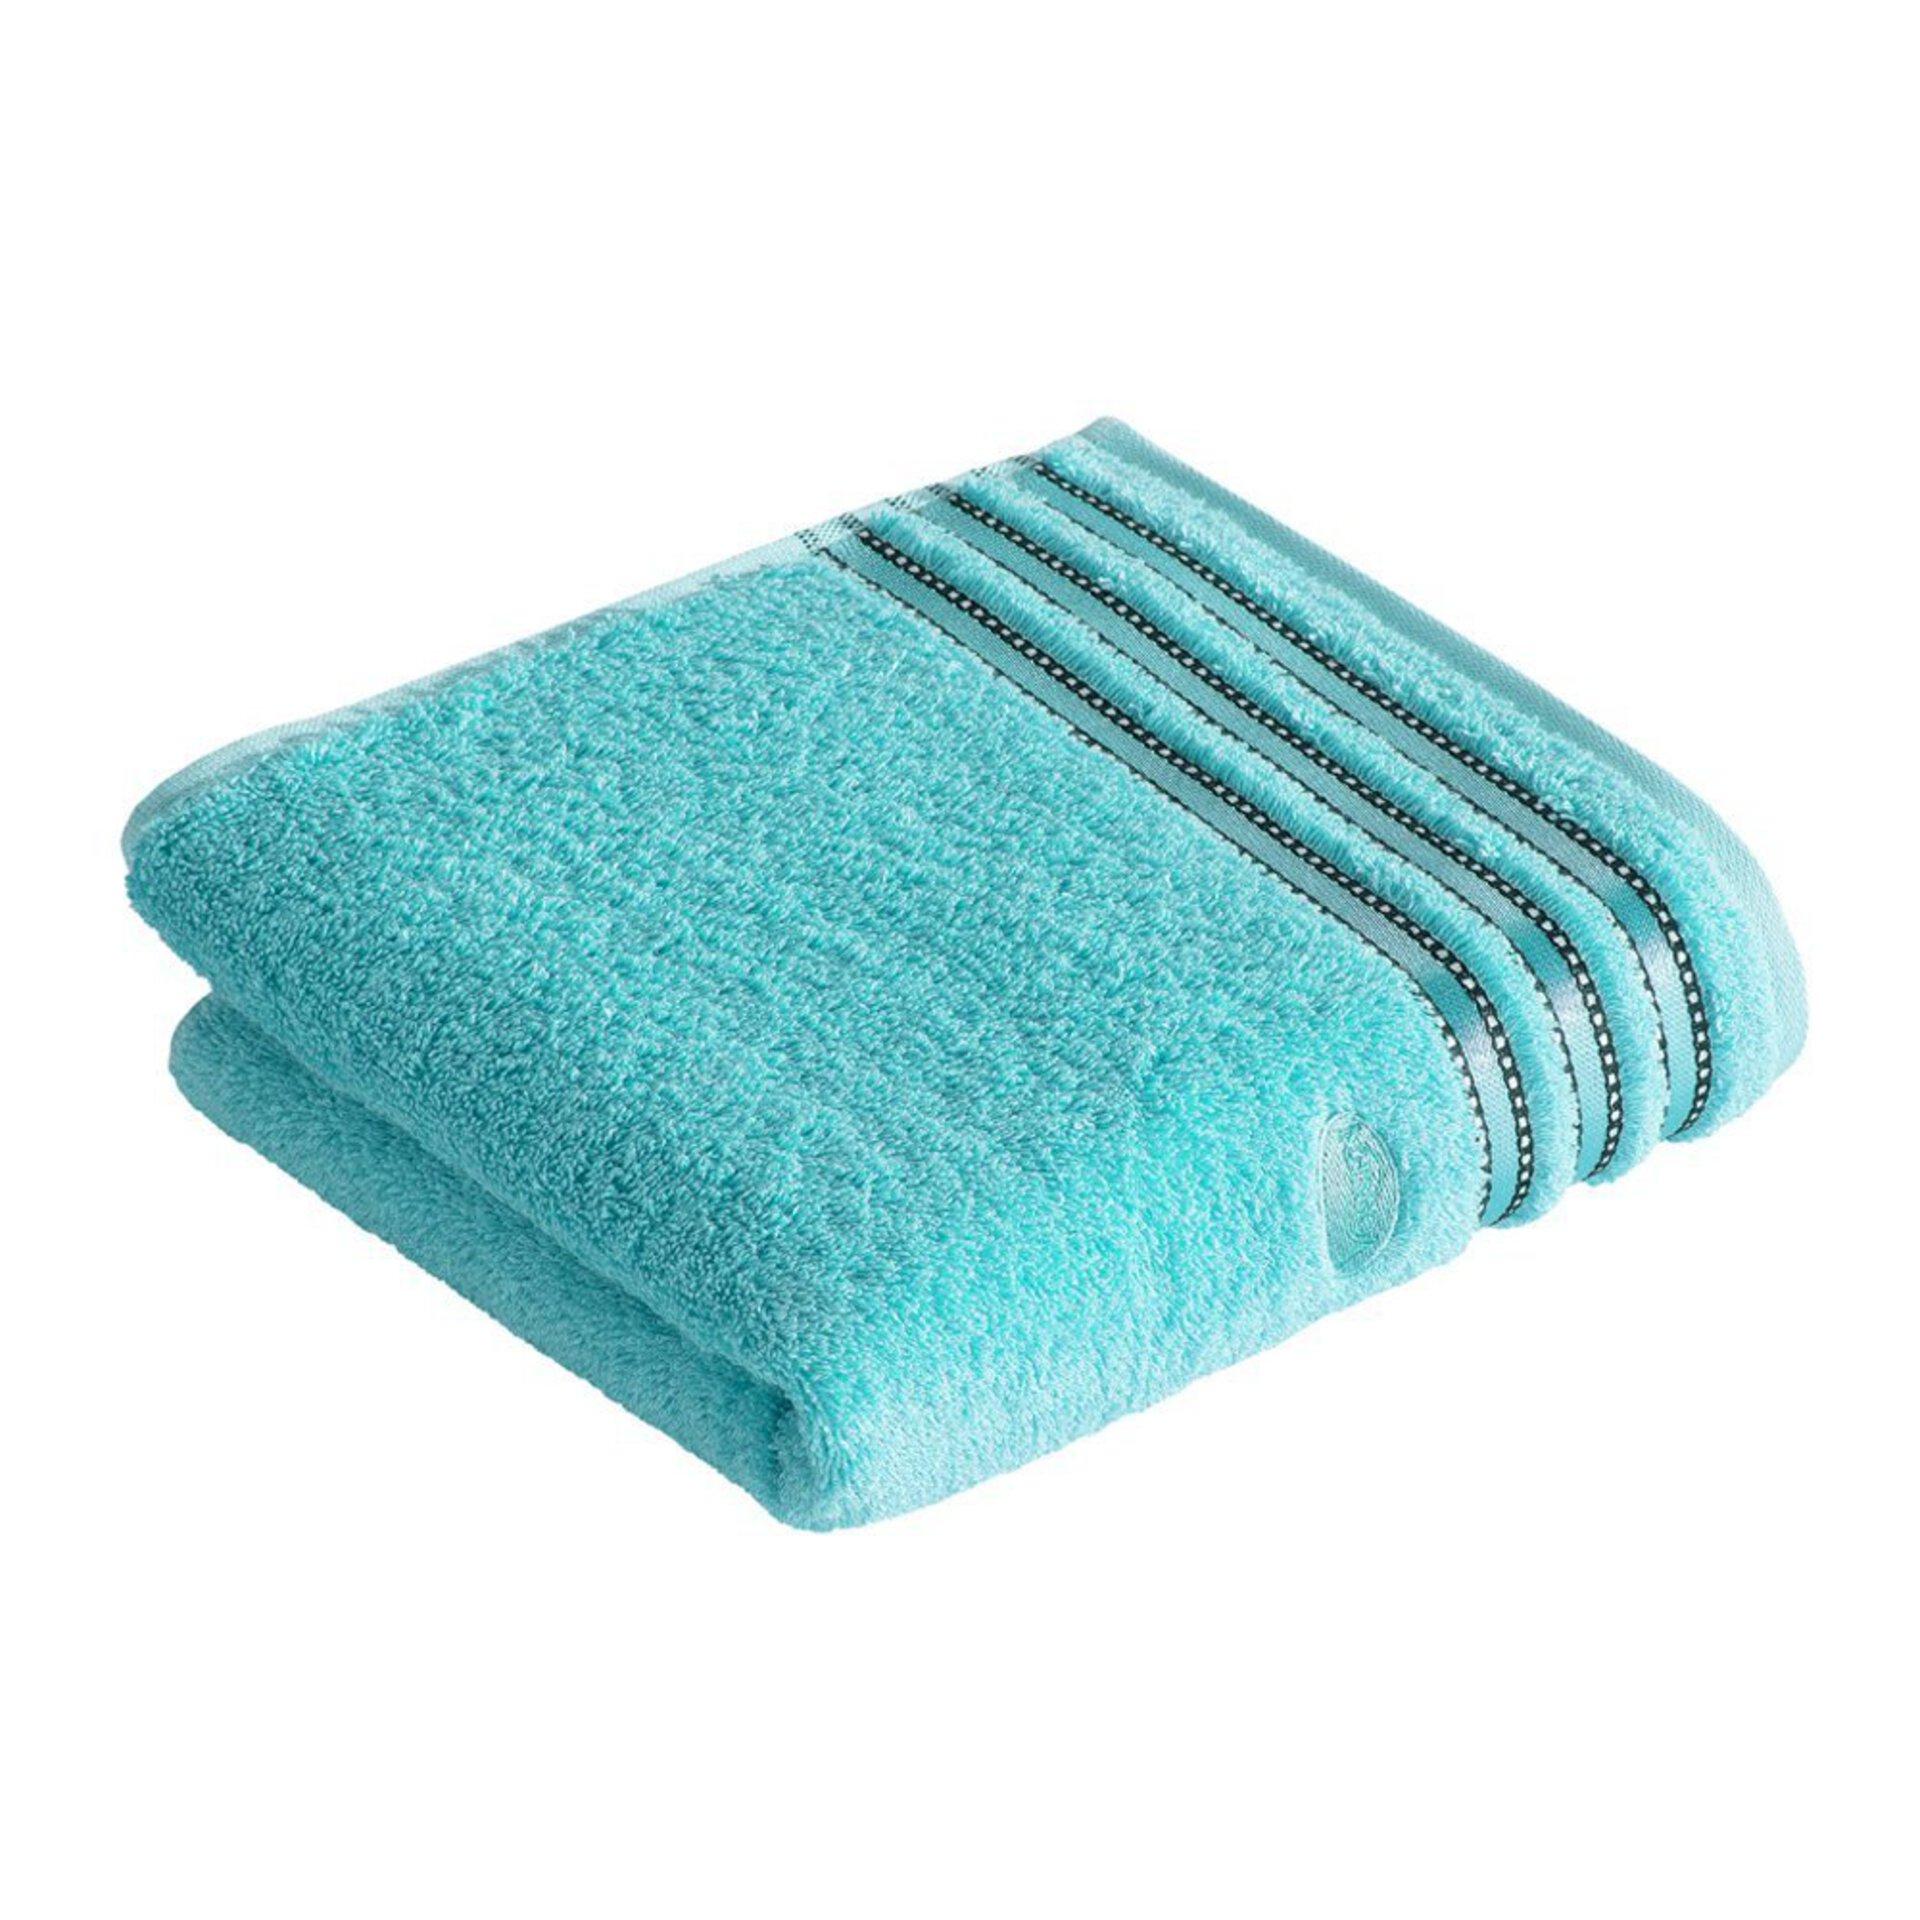 Handtuch Cult de Luxe Vossen Textil Blau 1 x 1 cm